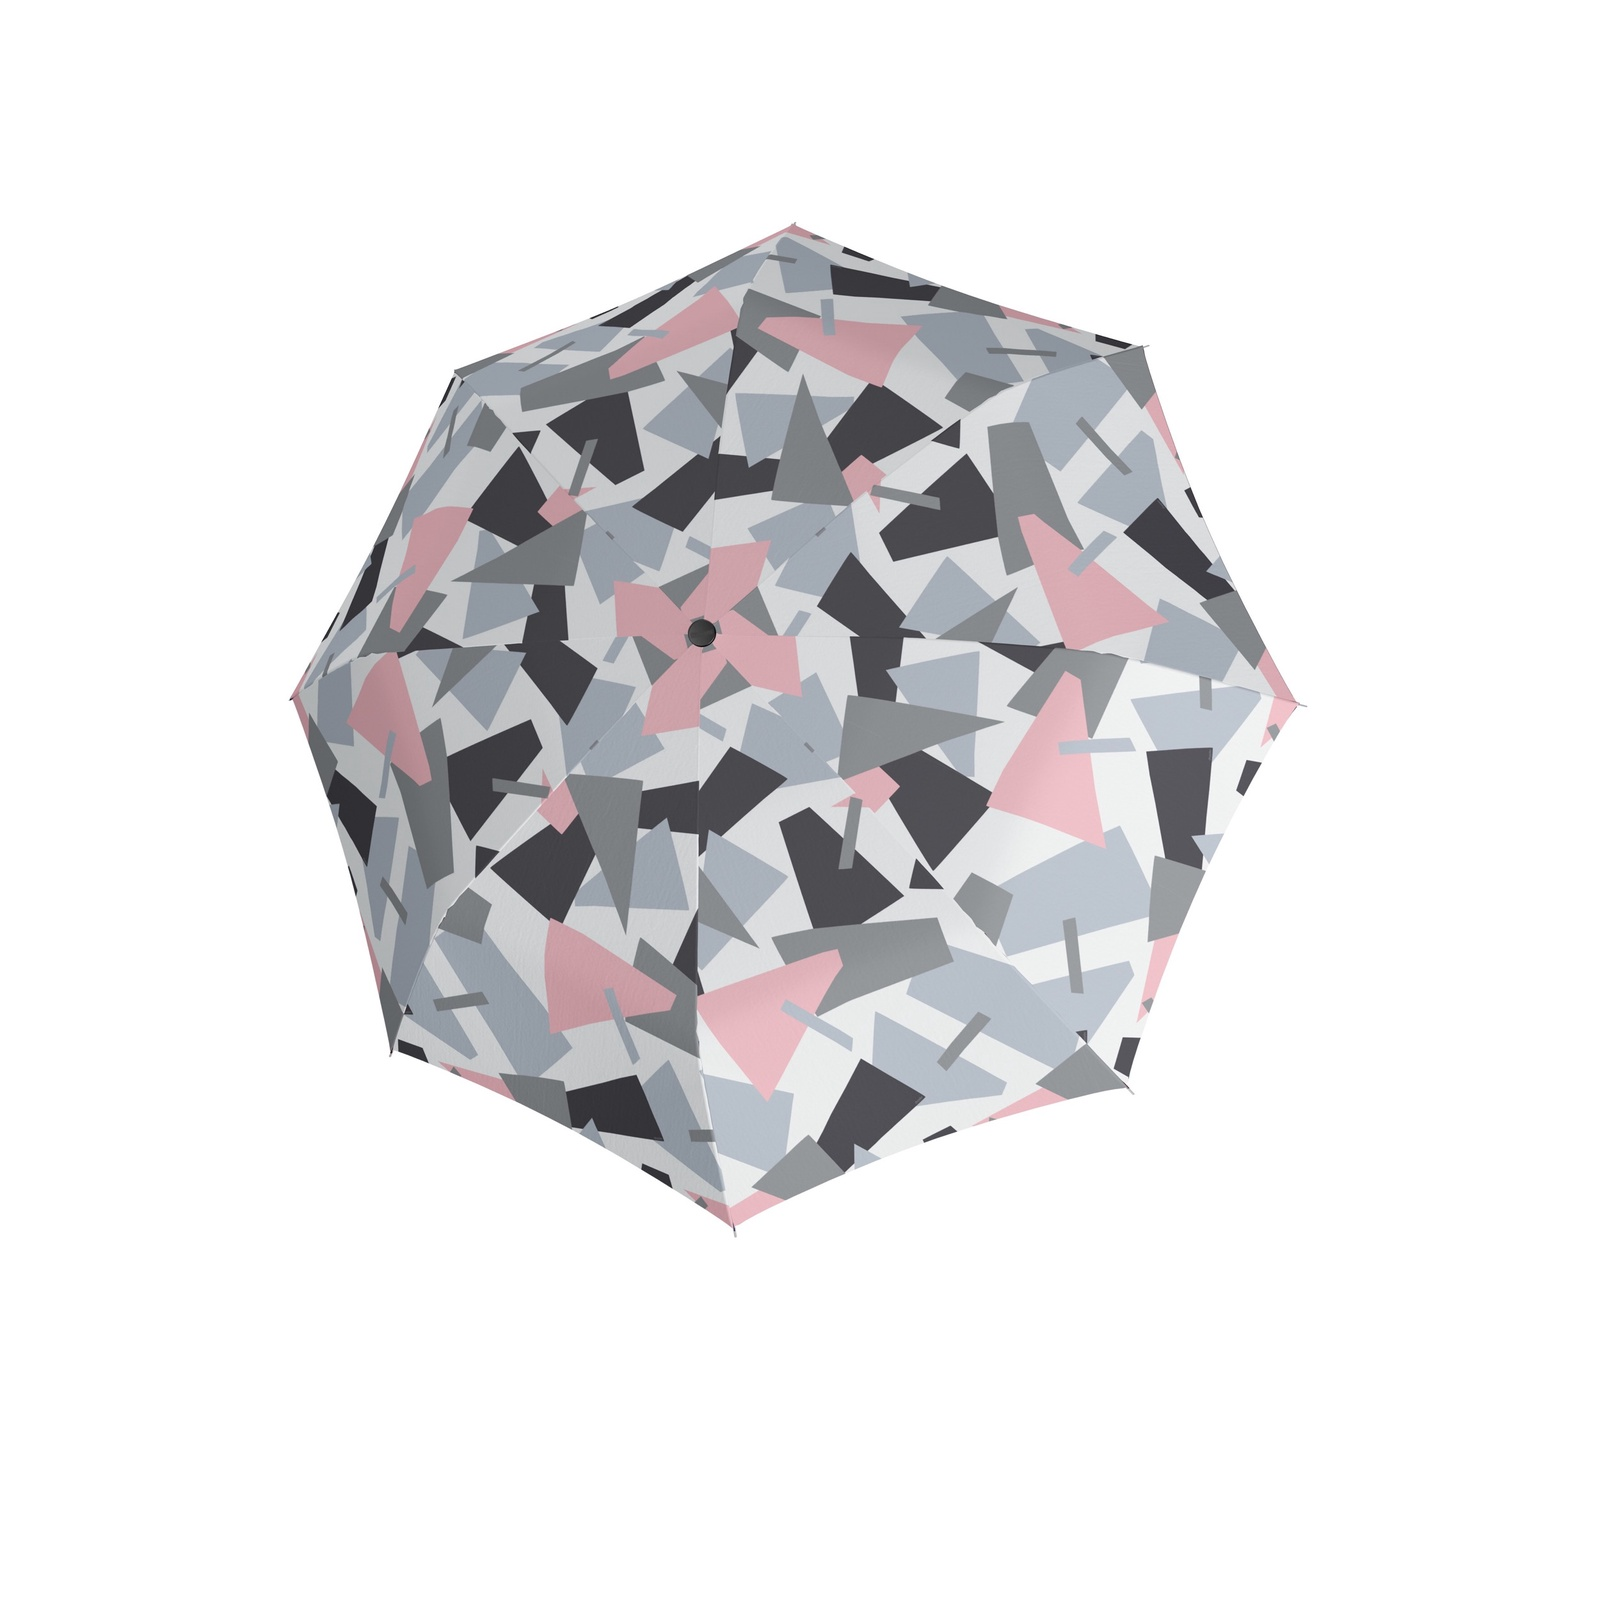 Зонт Doppler Crush, бежевый, серый, черный, черно-серый, розовый цена